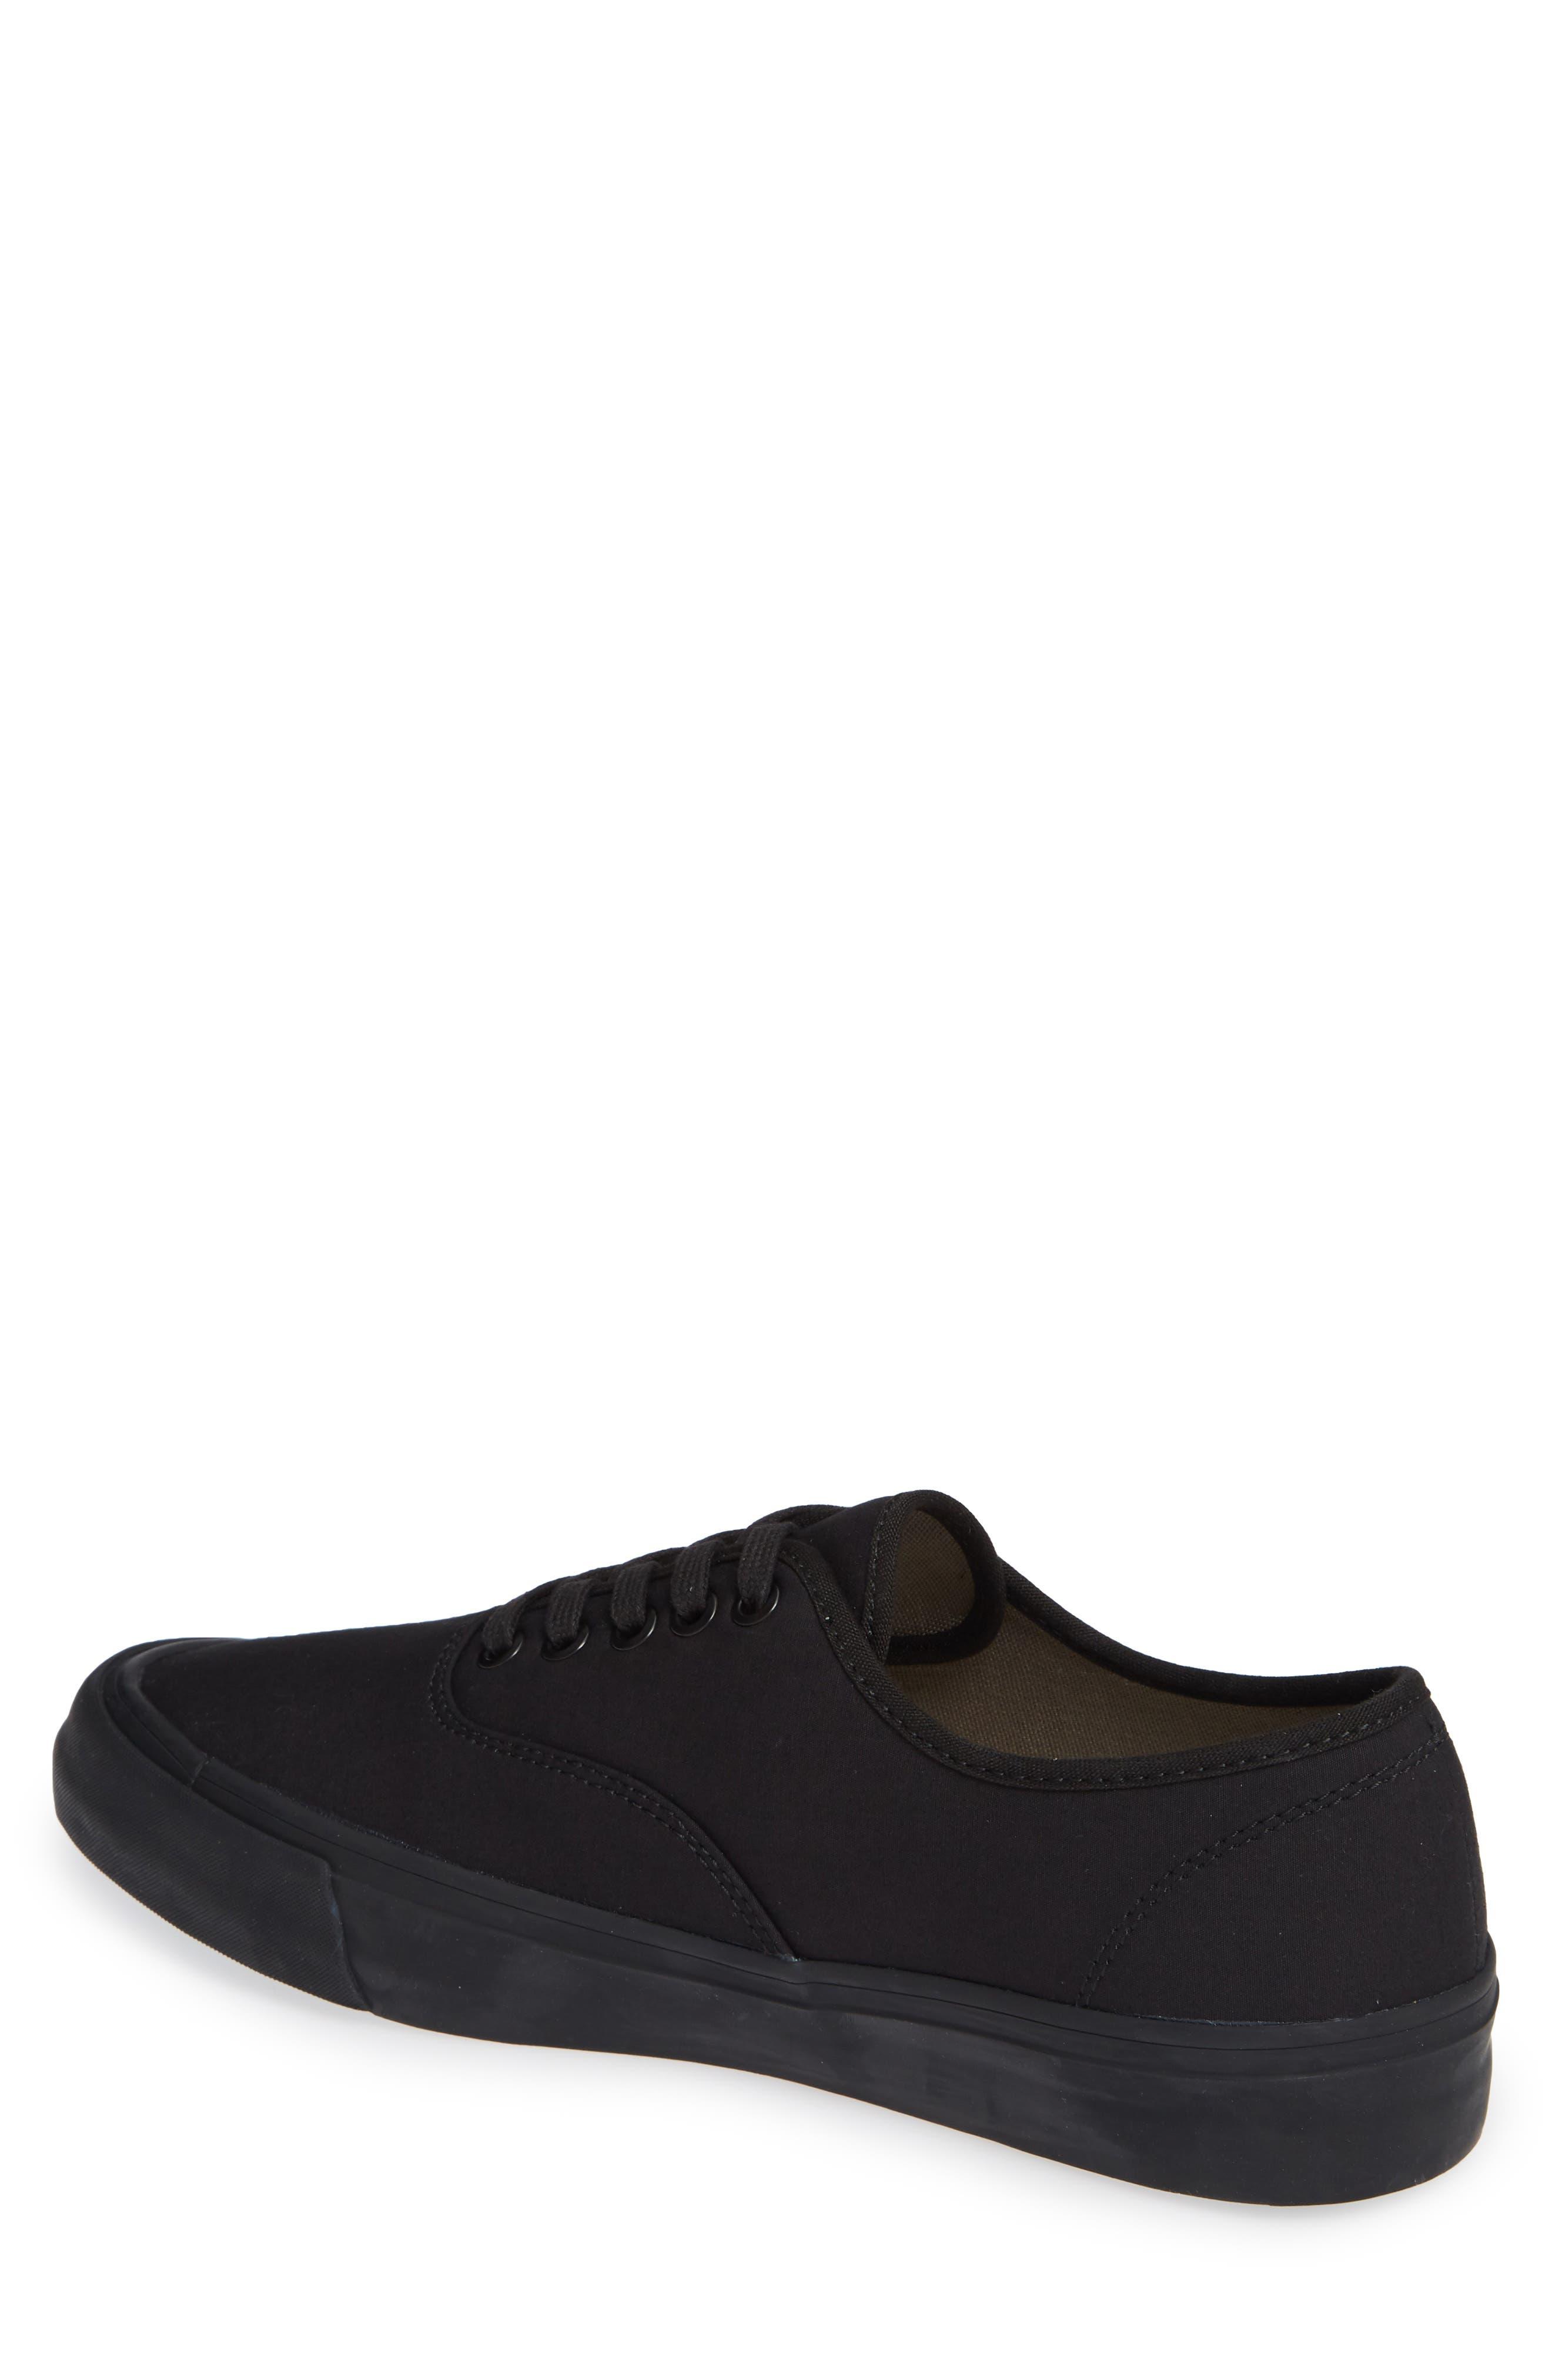 Legend Standard Sneaker,                             Alternate thumbnail 2, color,                             BLACK